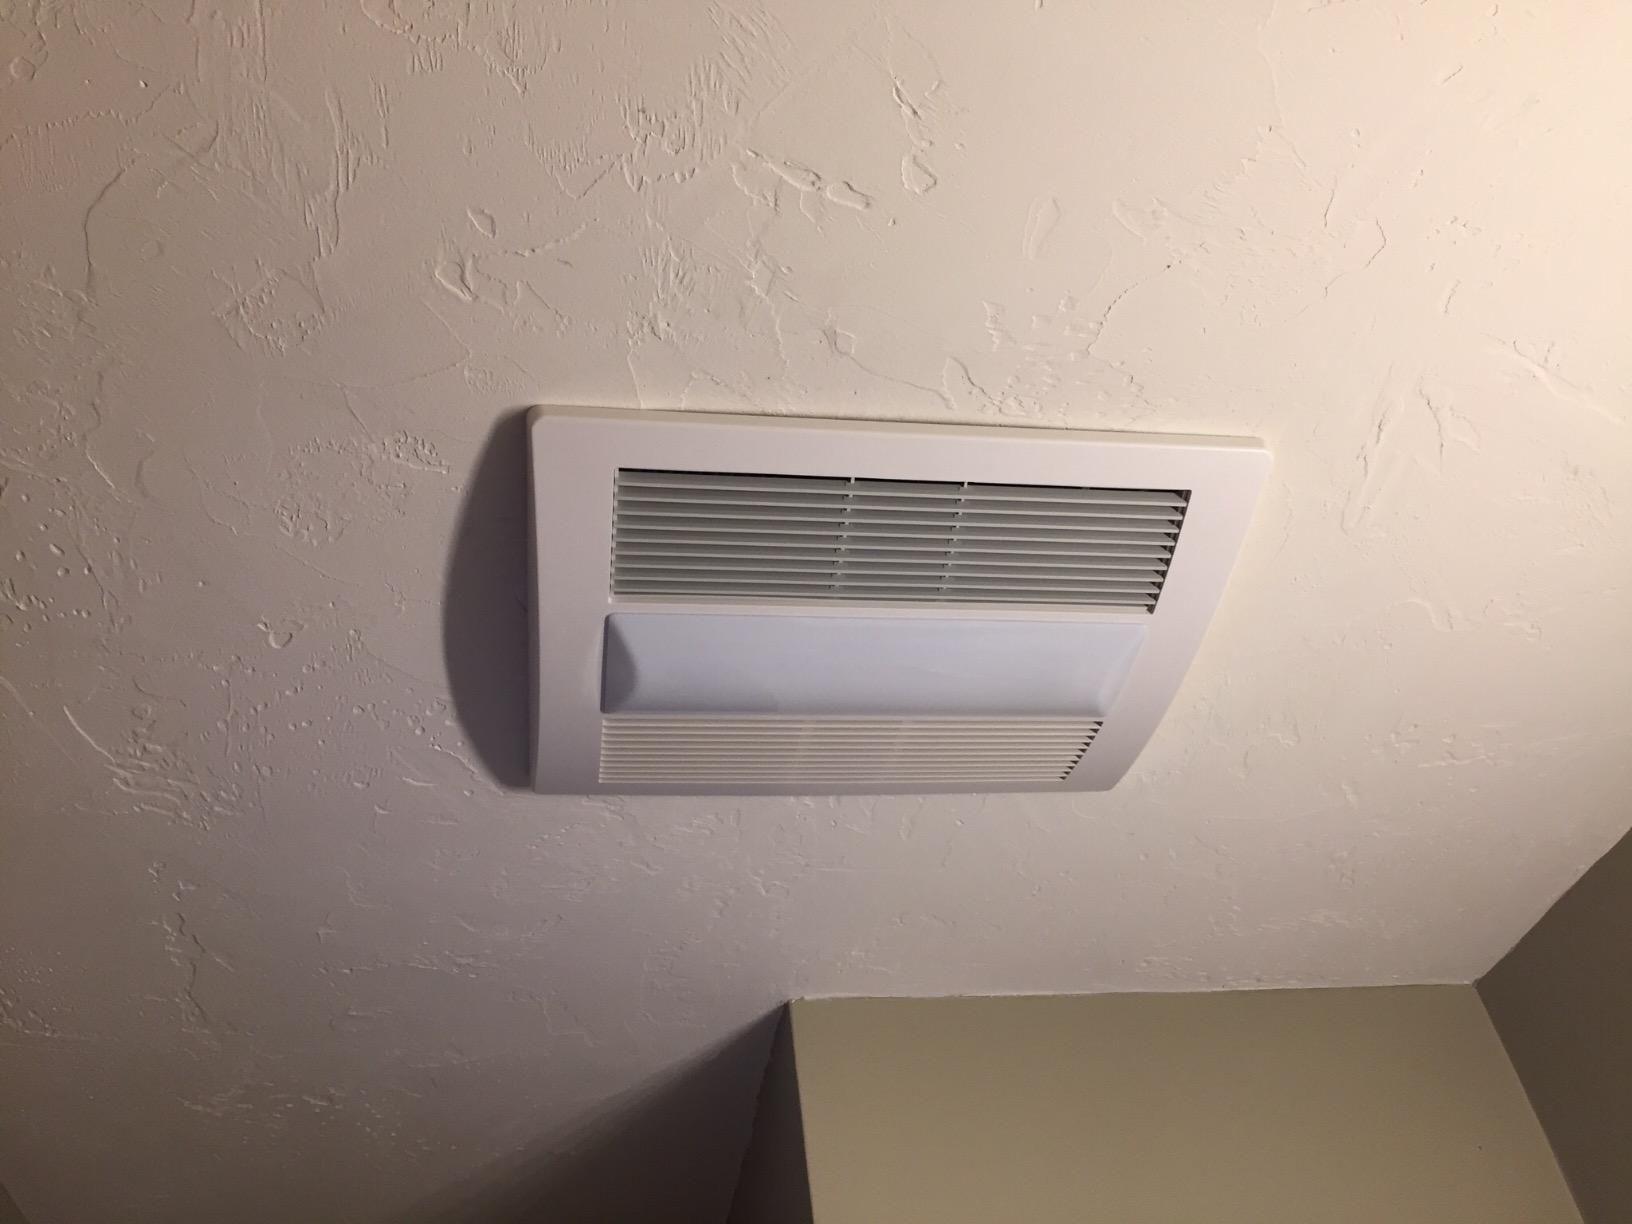 Best Bathroom Exhaust Fan And Light